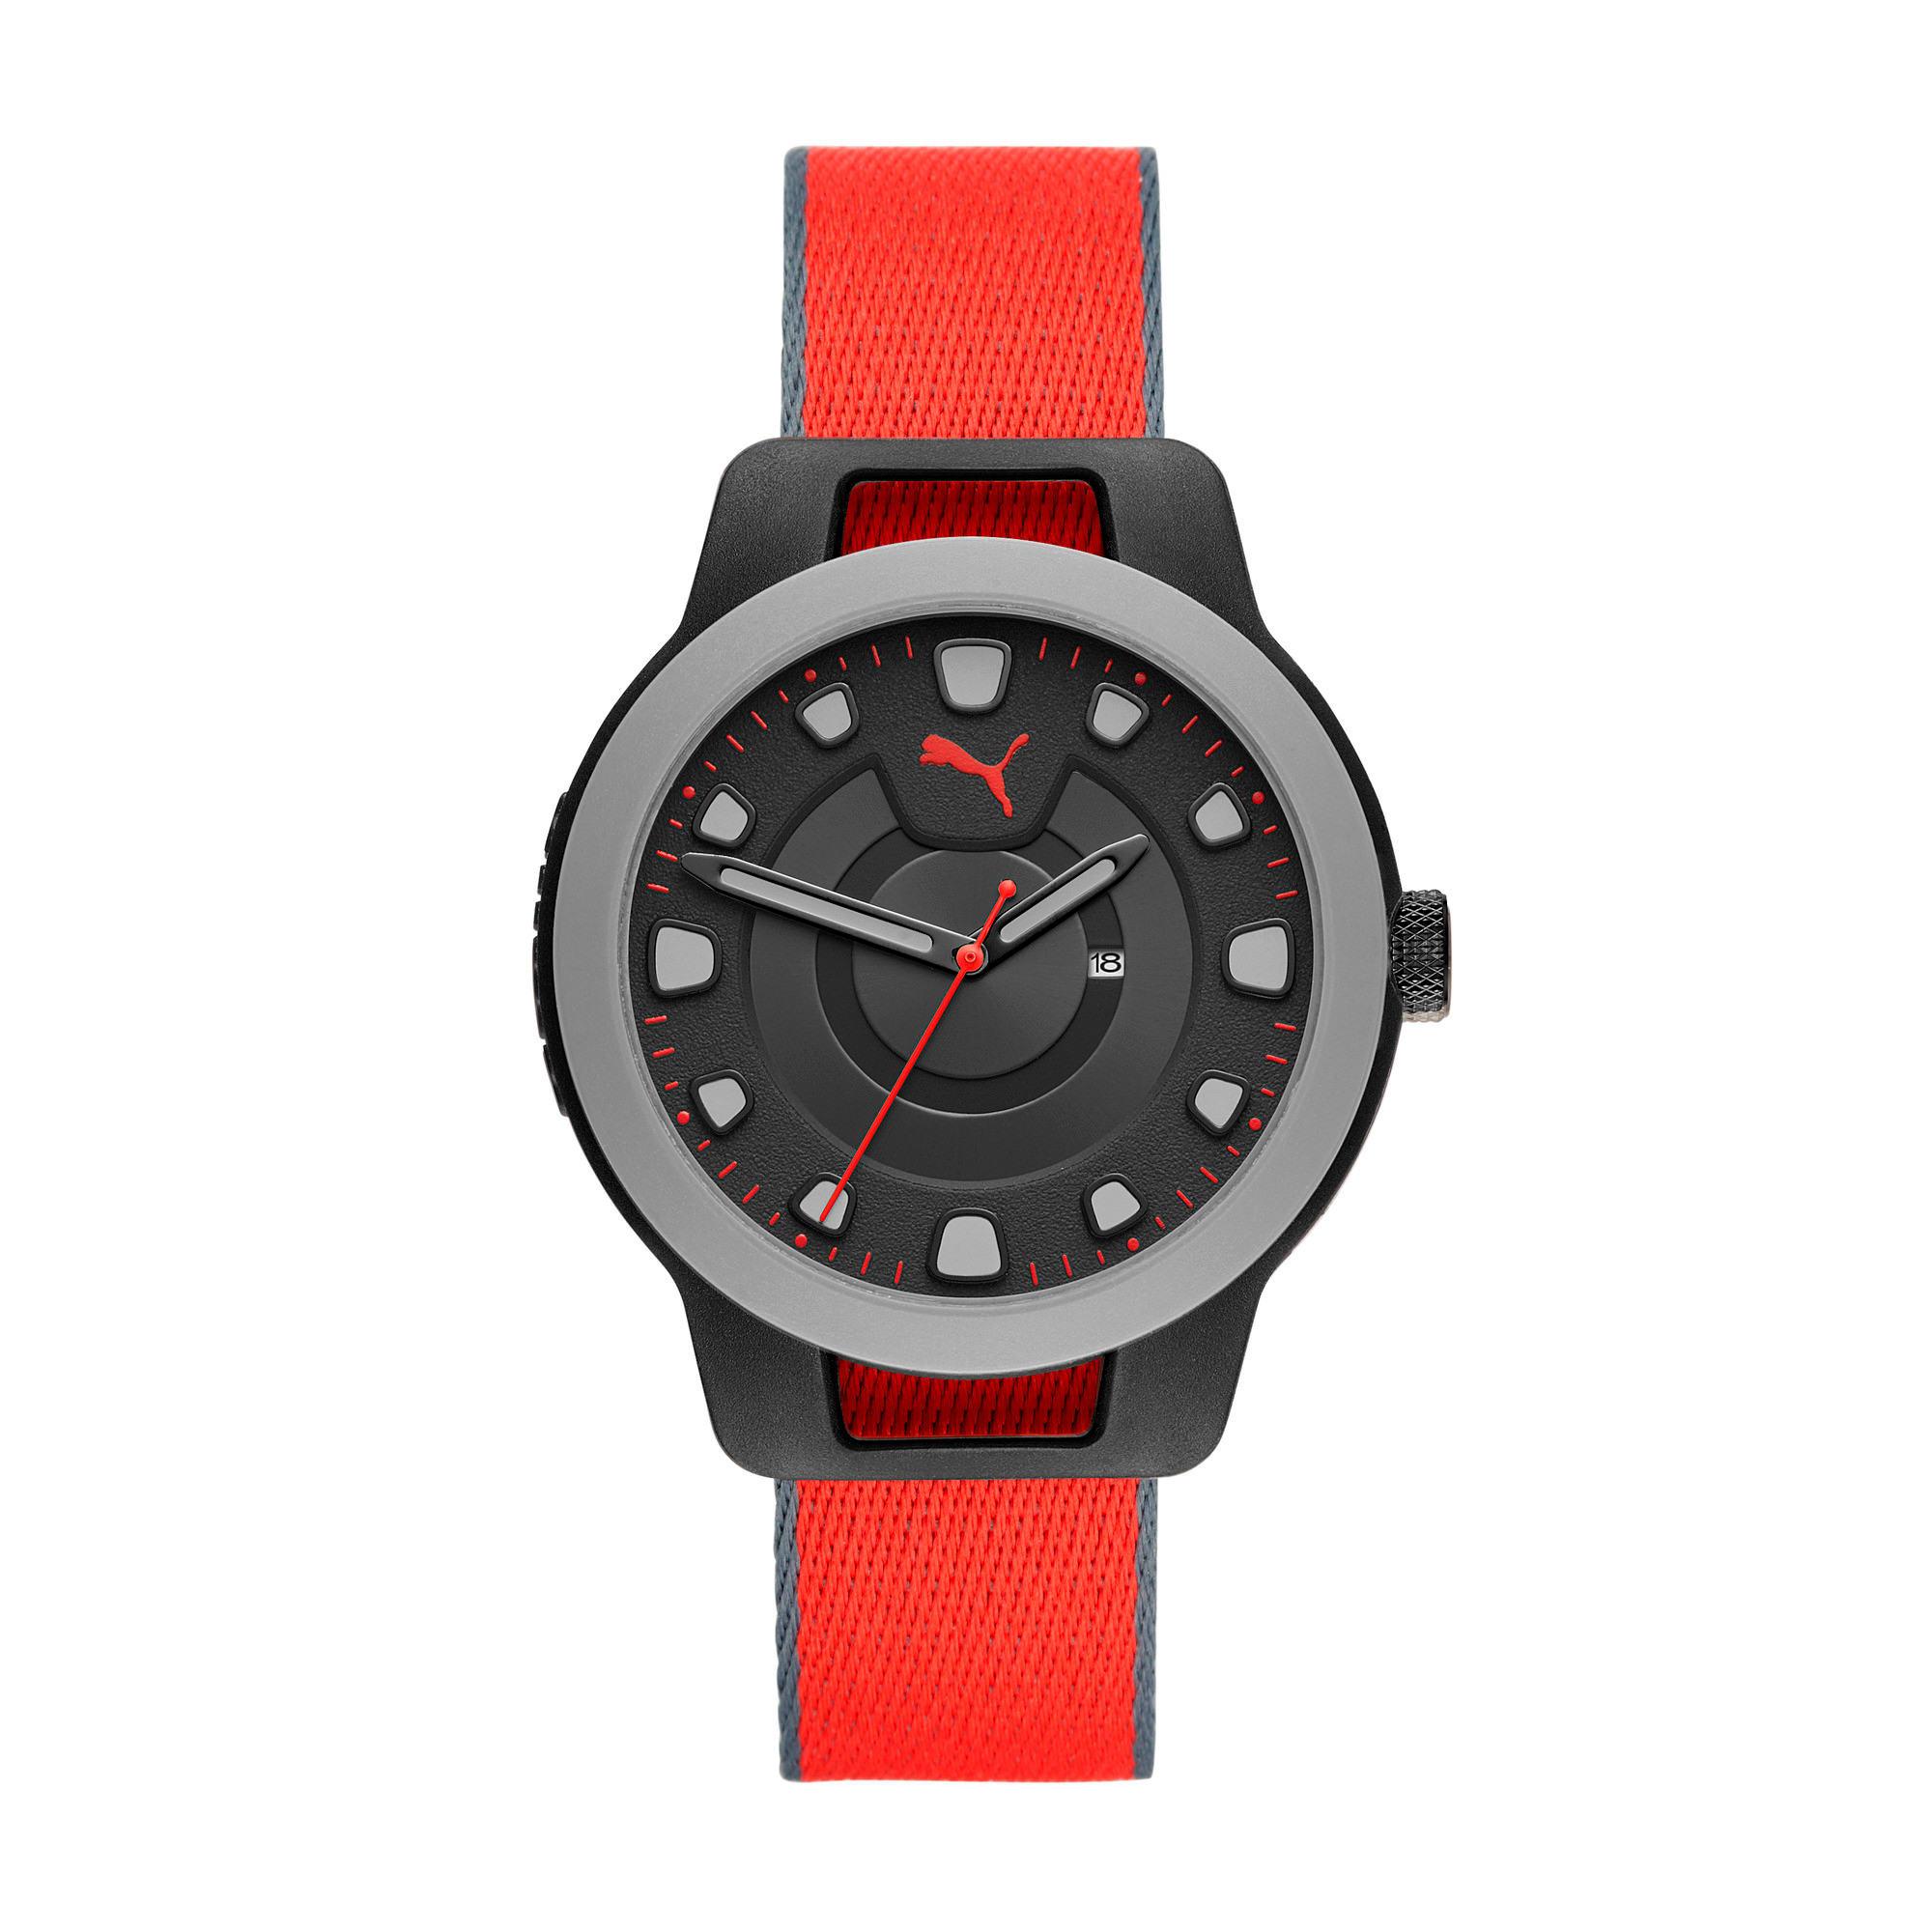 Thumbnail 3 of Reset v1 Reversible Watch, Blue/Red, medium